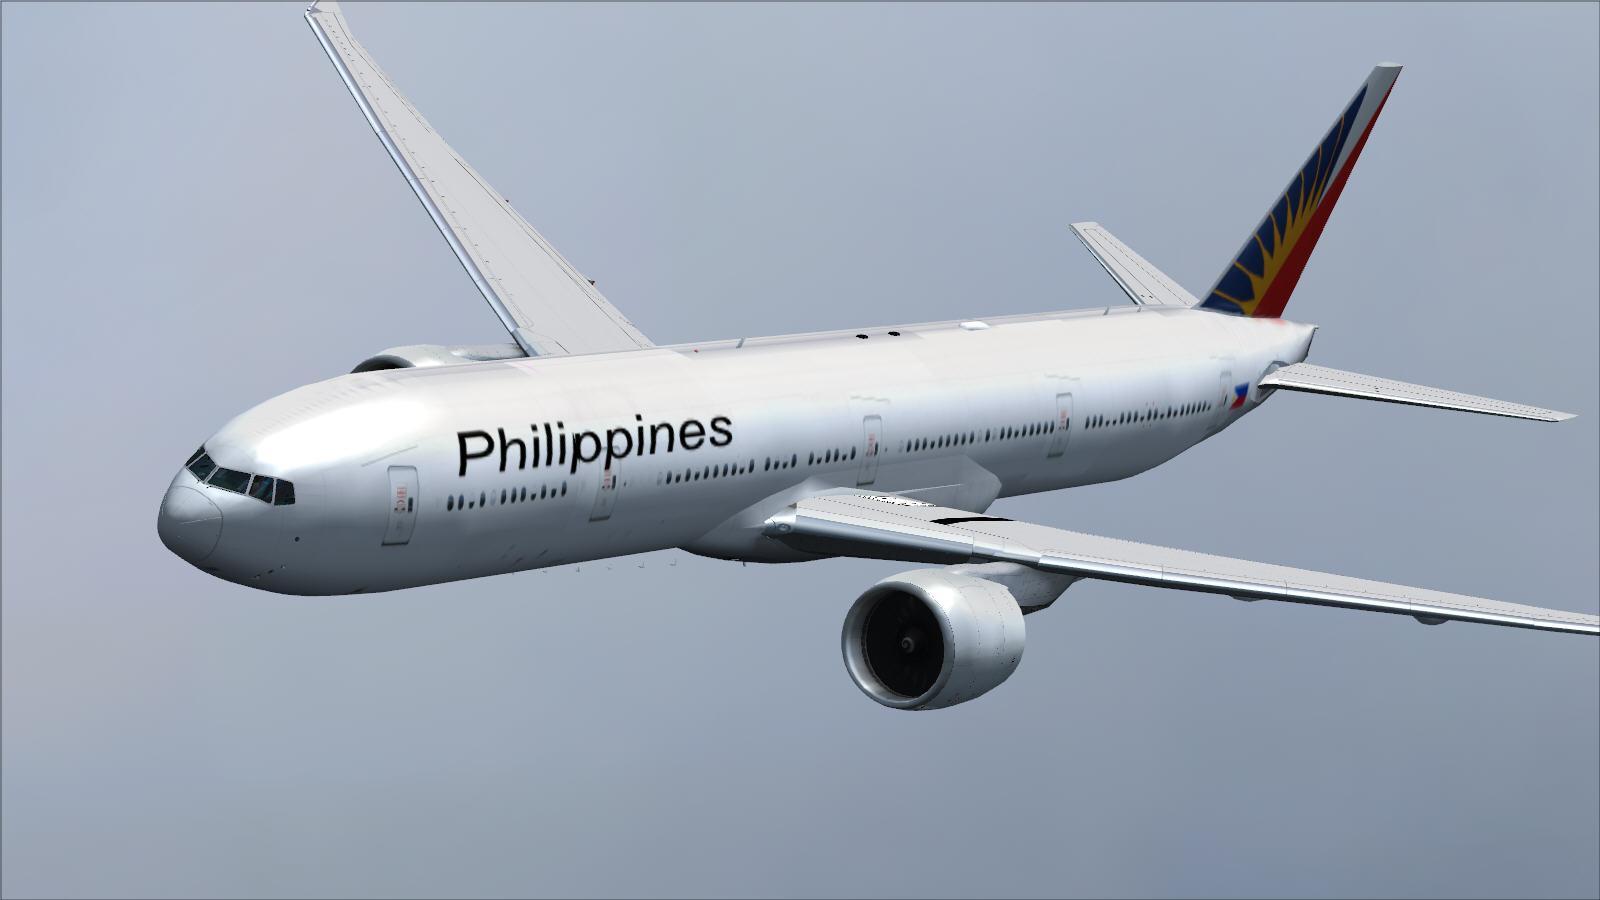 Обои 777, авиалайнер, philippines, боинг, 300, boeing, пассажирский. Авиация foto 6